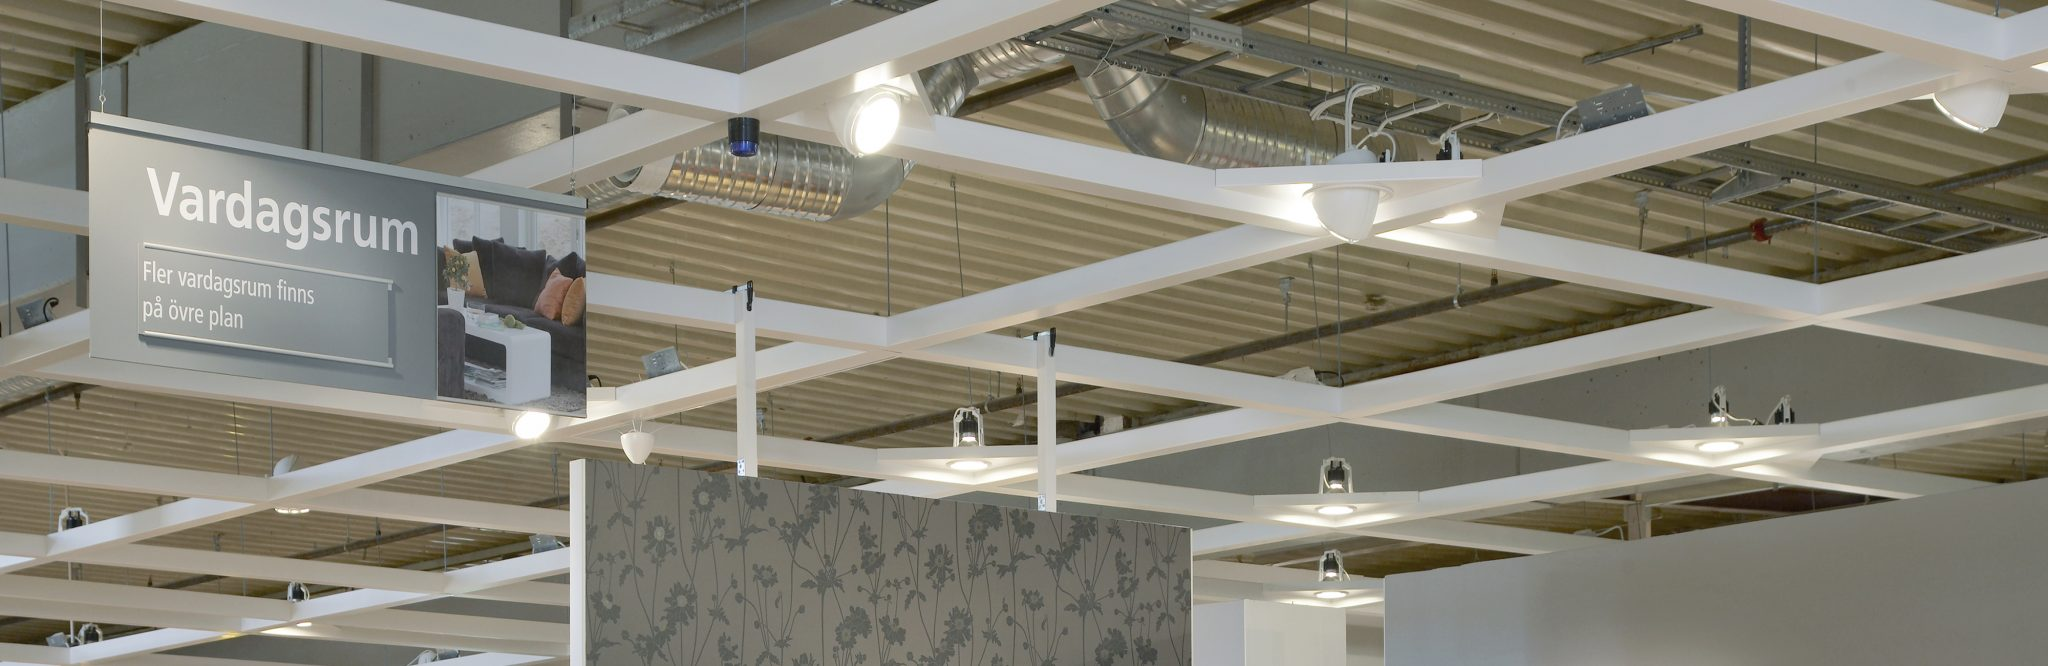 A system ceiling in a standard arrangement.